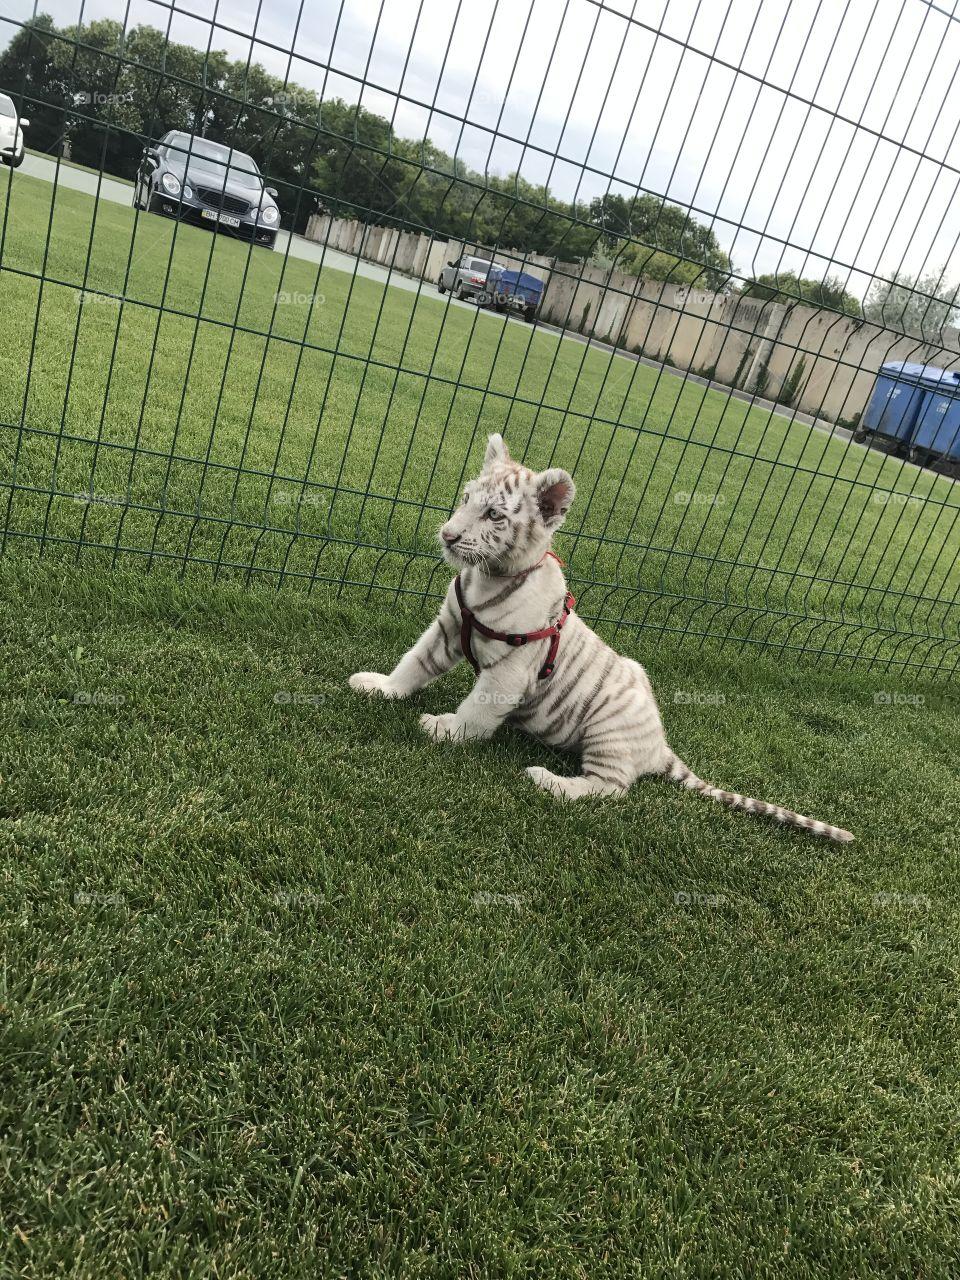 Tiger wait